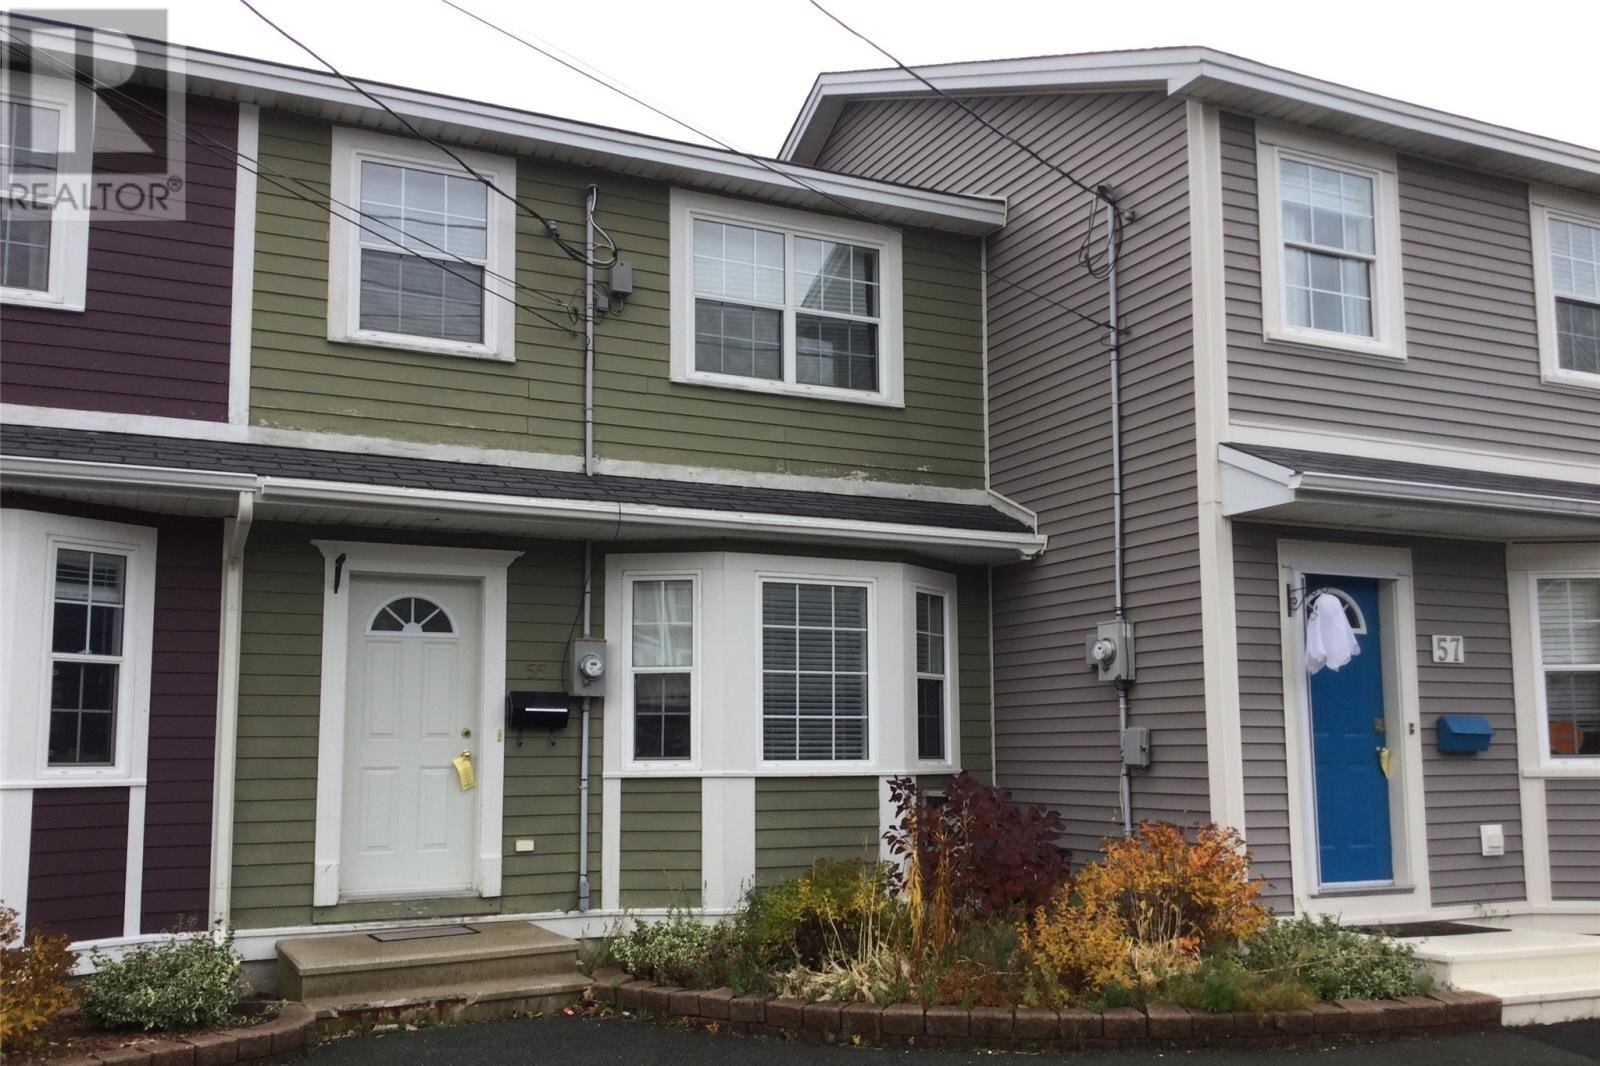 House for sale at 55 Gilbert St St. John's Newfoundland - MLS: 1223418